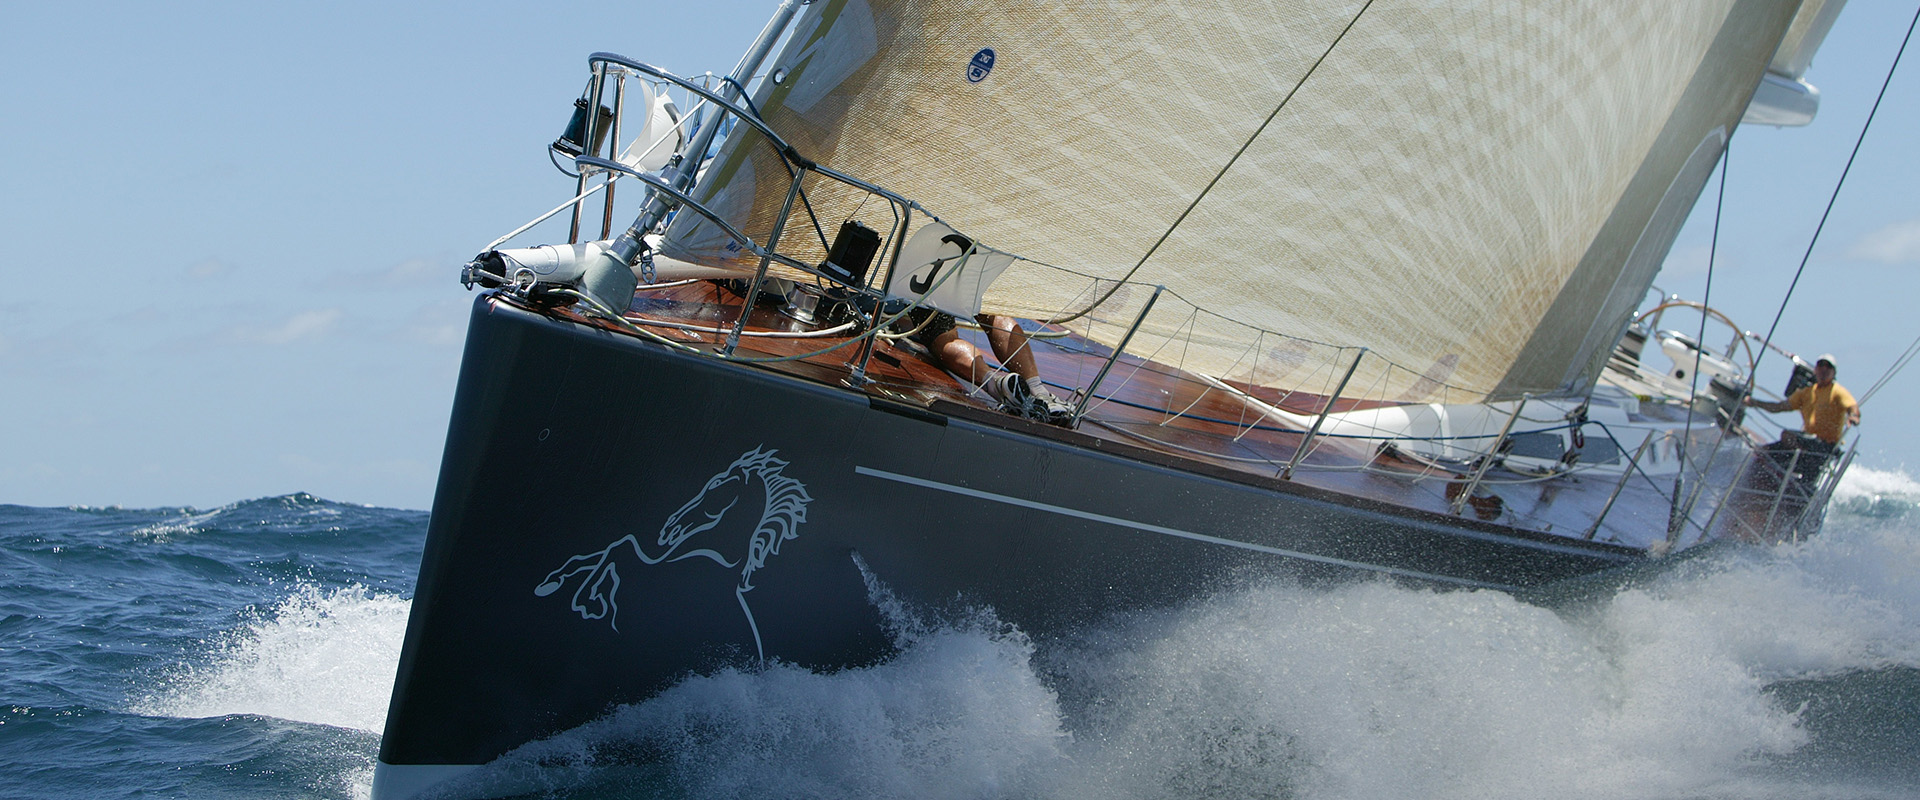 SW78 OCEAN HORSE (ex ALLSMOKE)